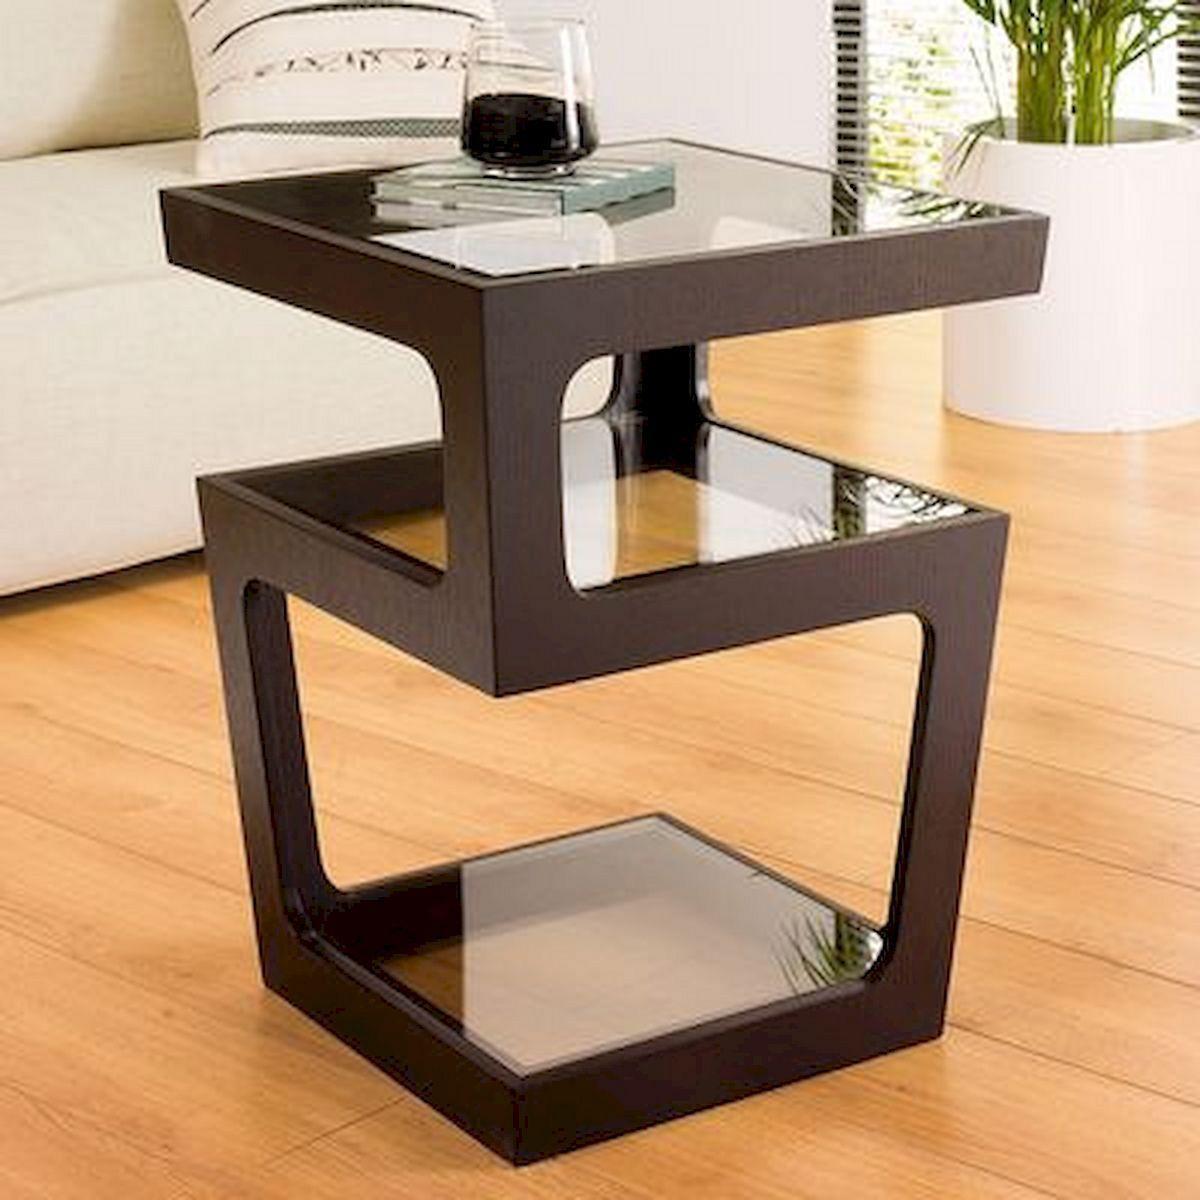 17 Fabulous Diy Furniture Makeover Design Ideas You Right To Copy Metal Furniture Design Metal Furniture Furniture Makeover Diy